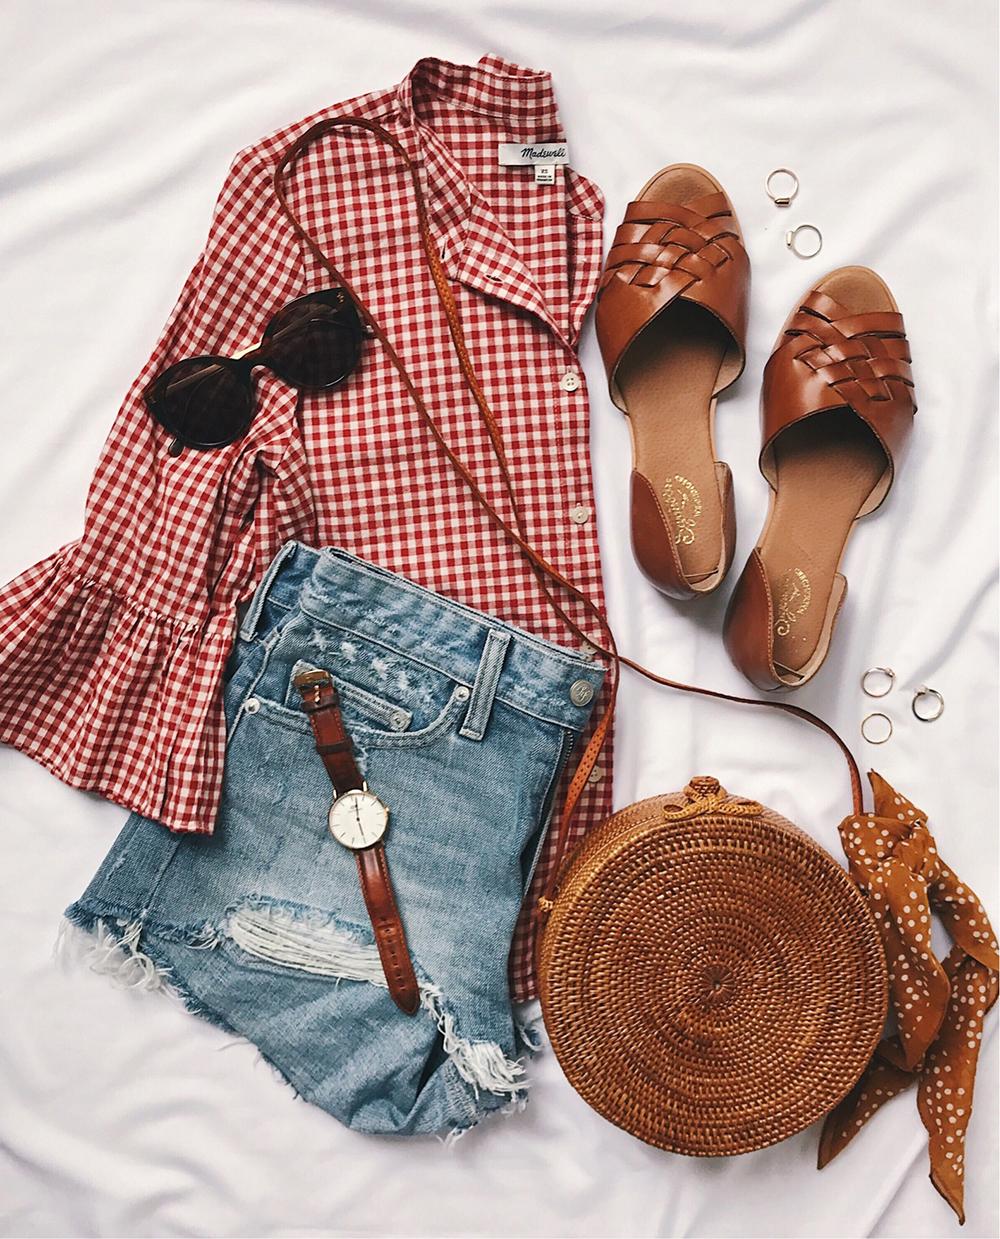 livvyland-blog-best-button-up-shirts-gingham-madewell-circle-wicker-straw-bag-1